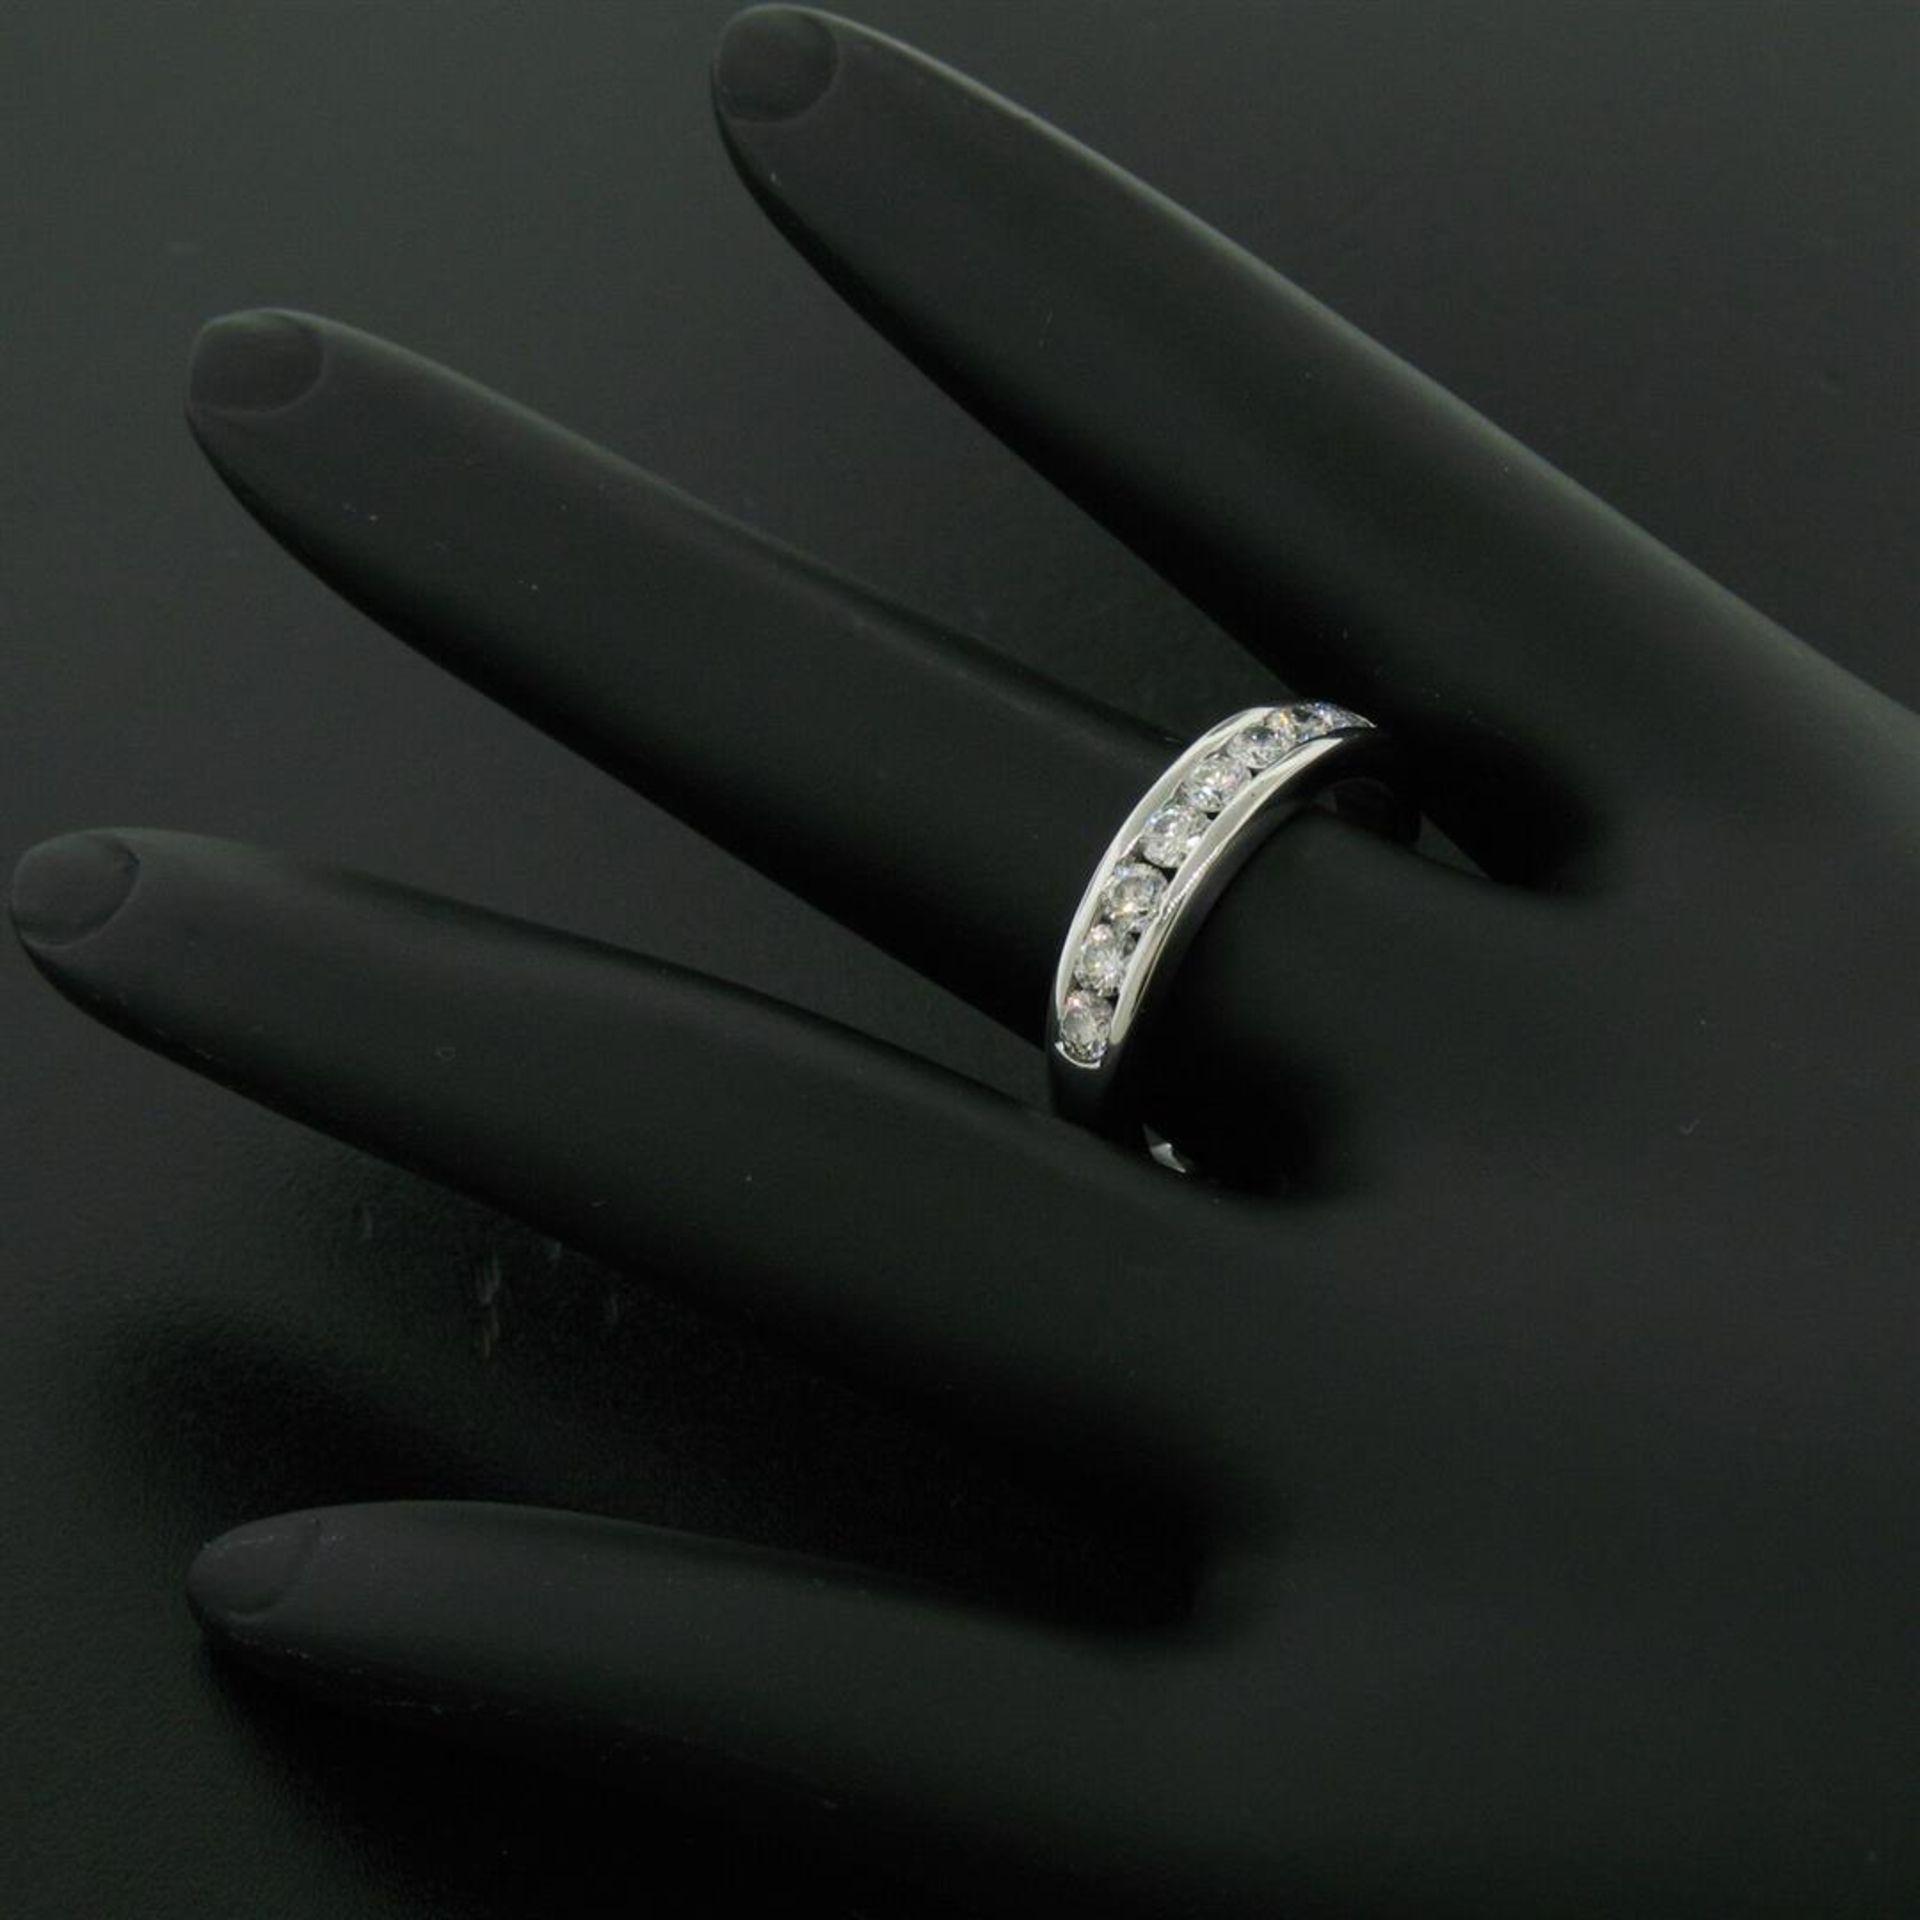 Classic Platinum .80ctw Channel Set Round Brilliant VS Diamond Wedding Band Ring - Image 8 of 8